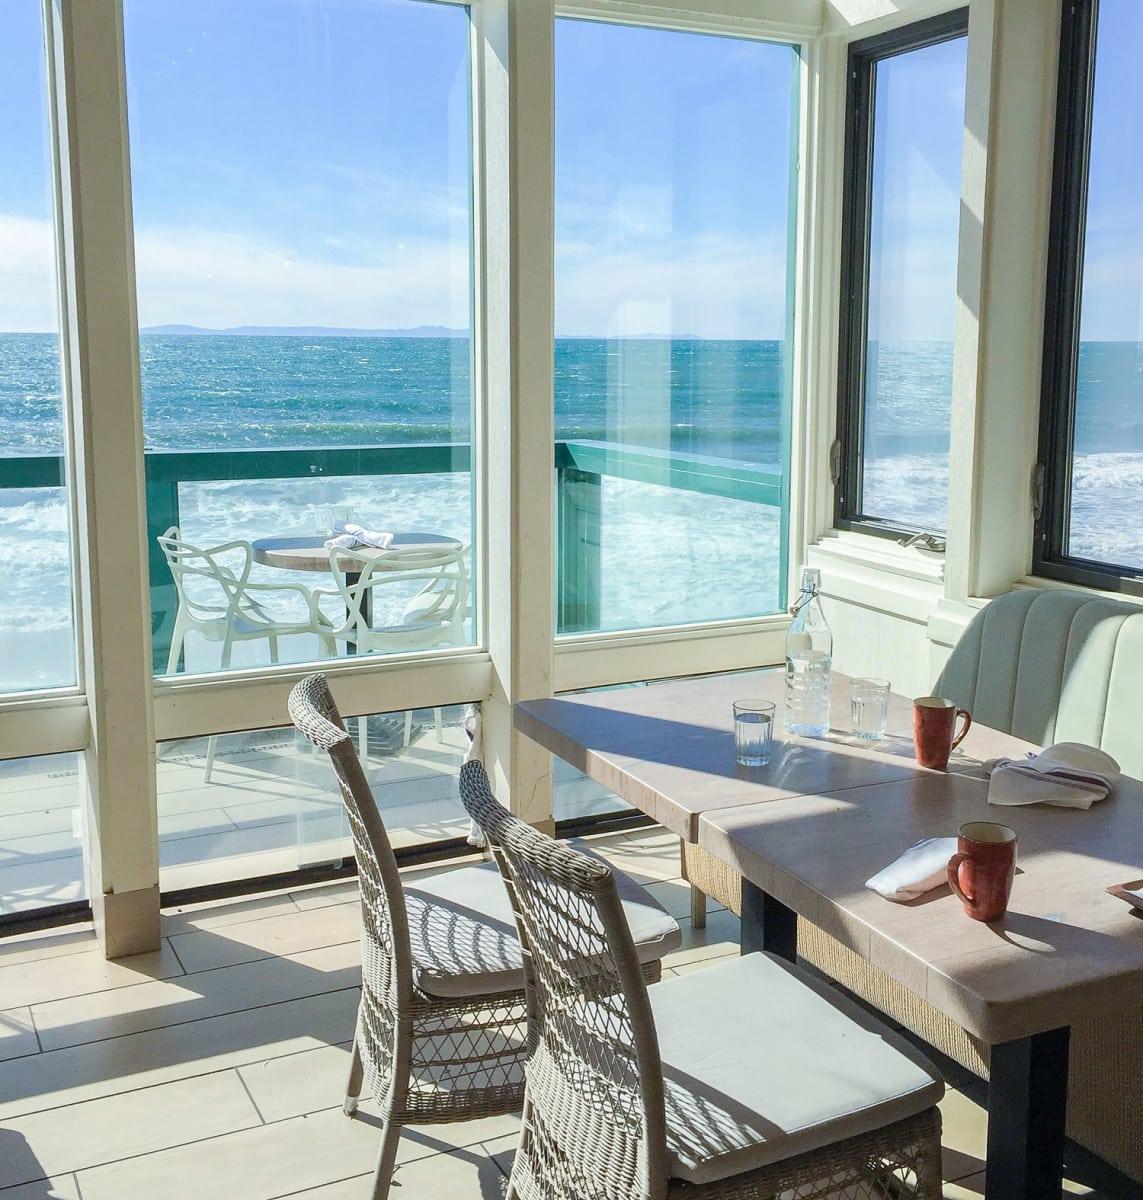 Driftwood Kitchen restaurant at the Pacific Edge Hotel in Laguna Beach, California